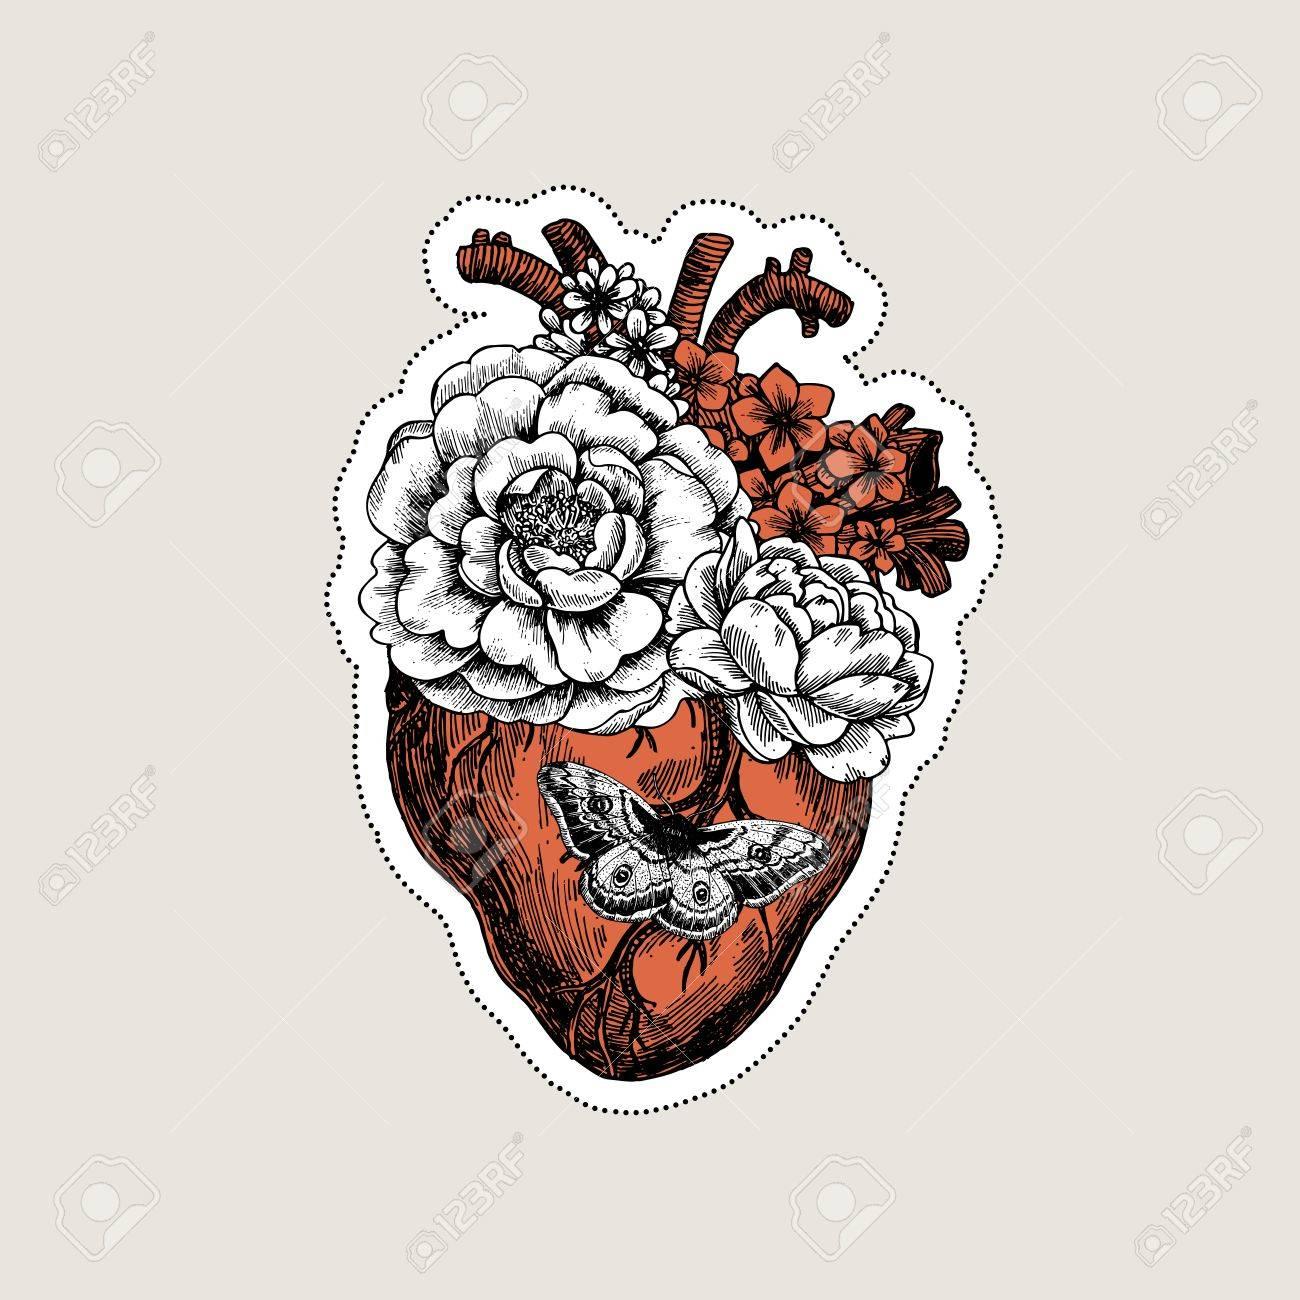 1300x1300 Tattoo Anatomy Vintage Illustration. Floral Anatomical Heart